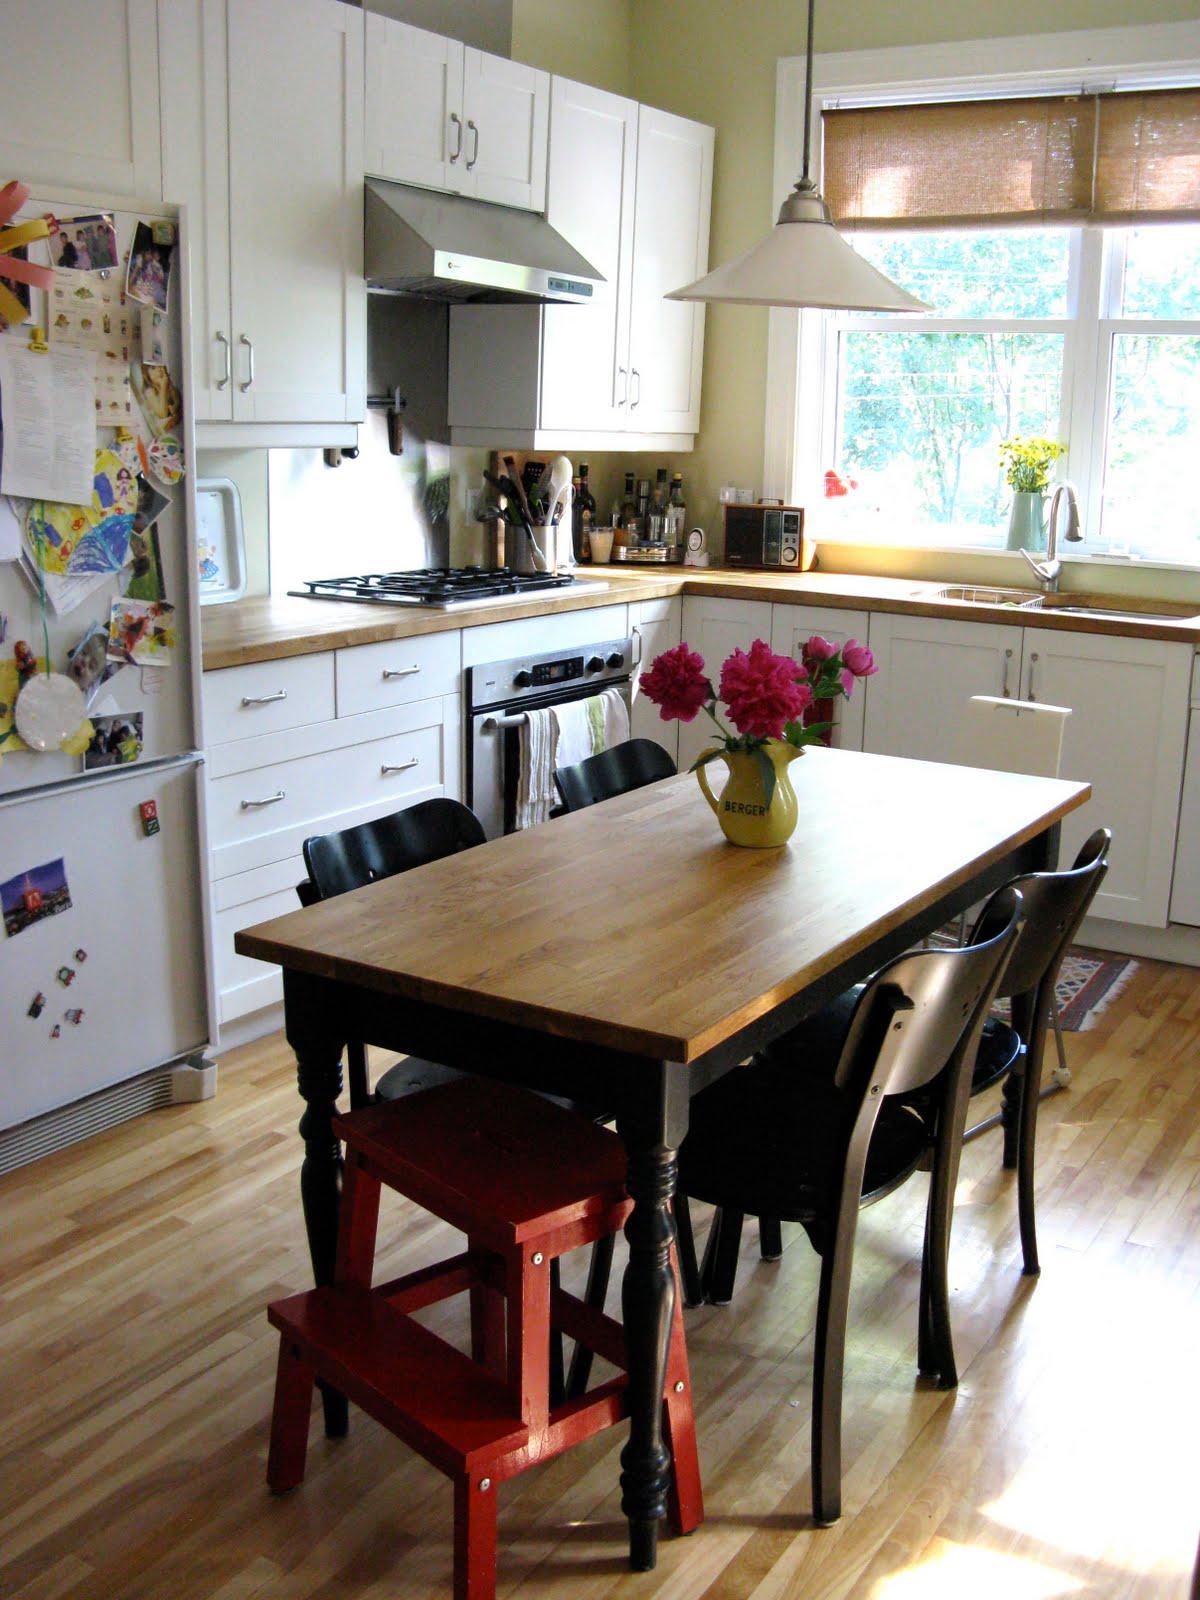 pour toujours: The kitchen and office corner, La cuisine